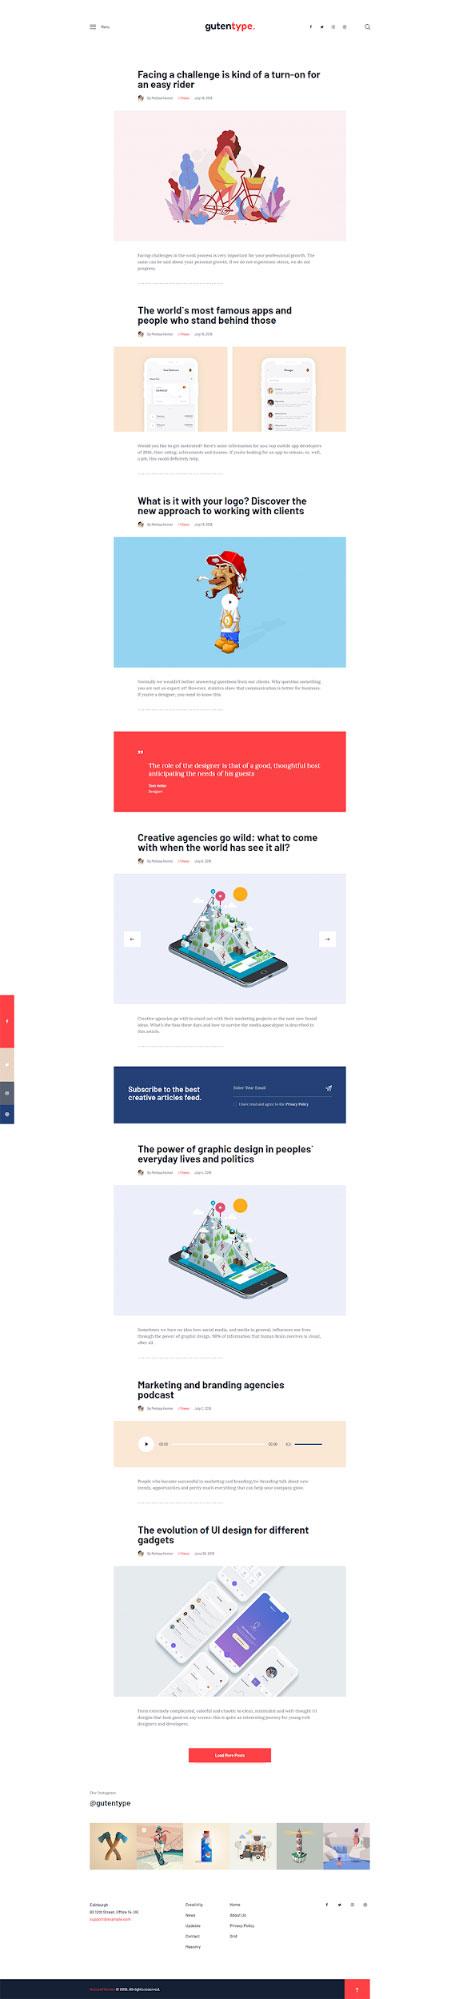 gutentype-blog-layout